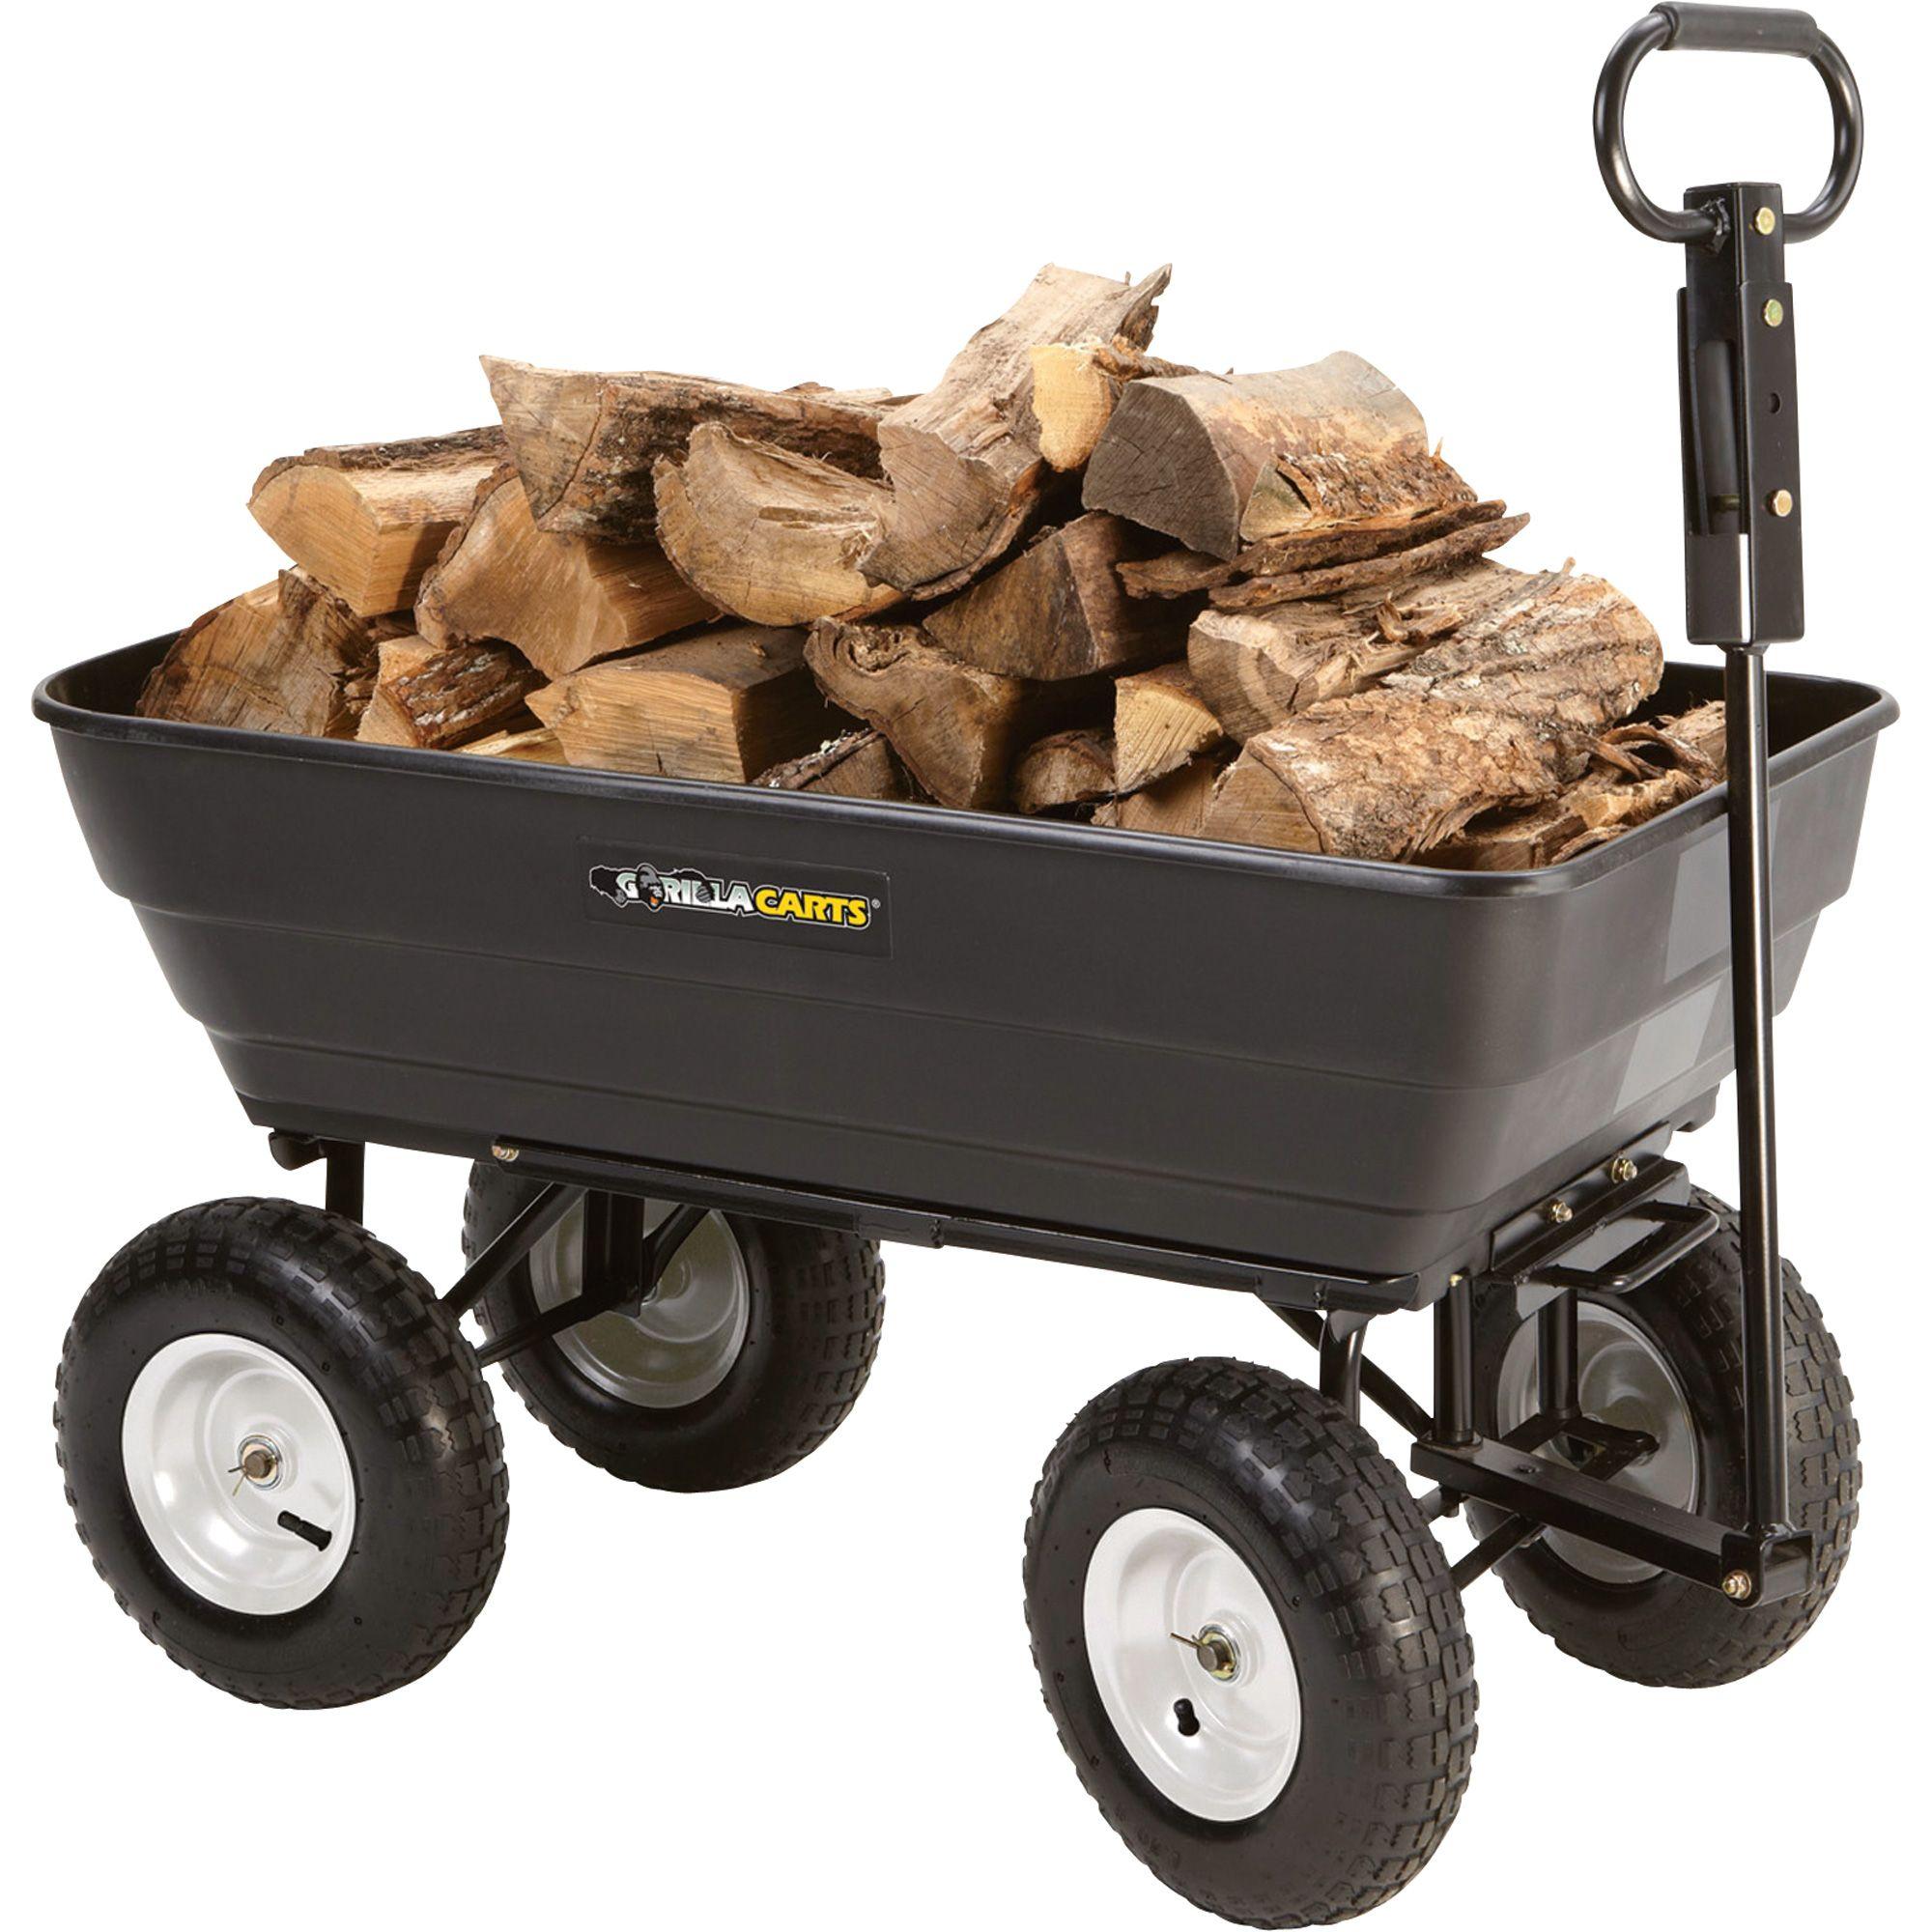 Gorilla Carts Dump Cart. The cart's patented quickrelease